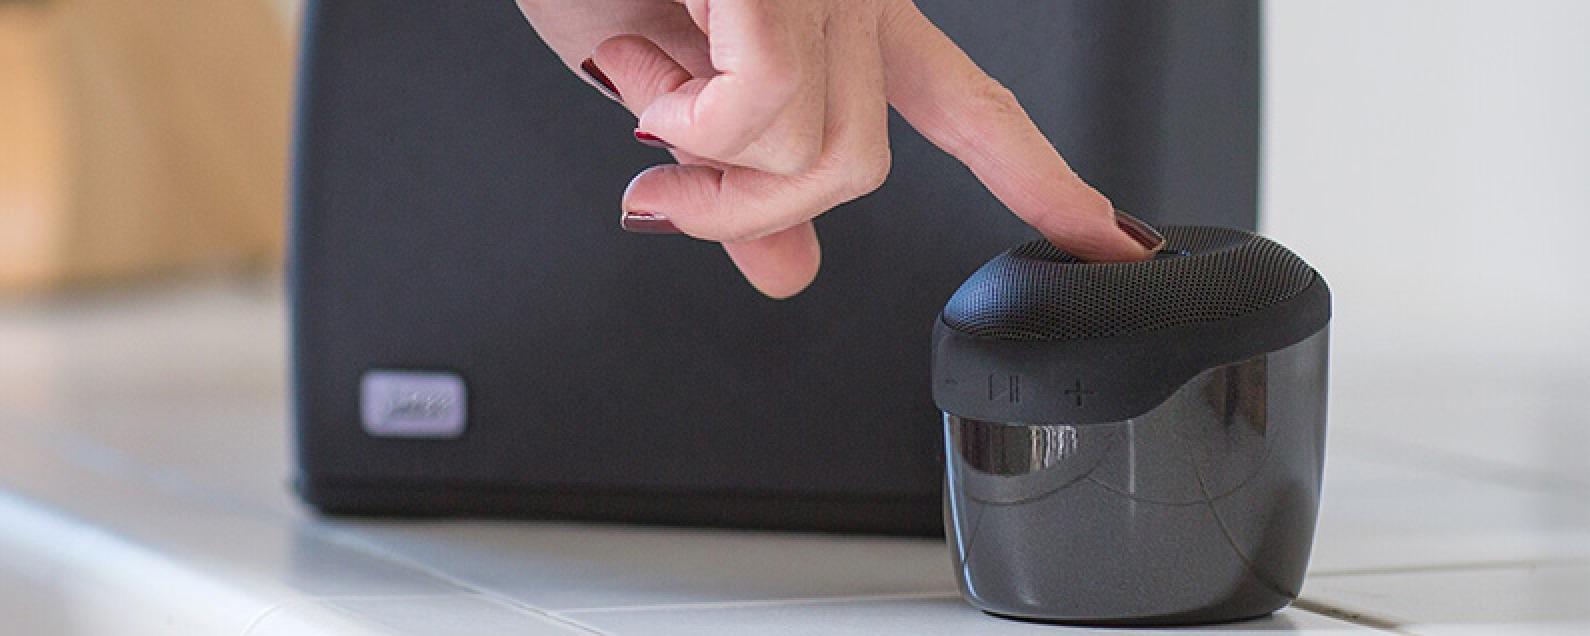 Review: Jam Voice Portable Speaker Adds Amazon Alexa Support